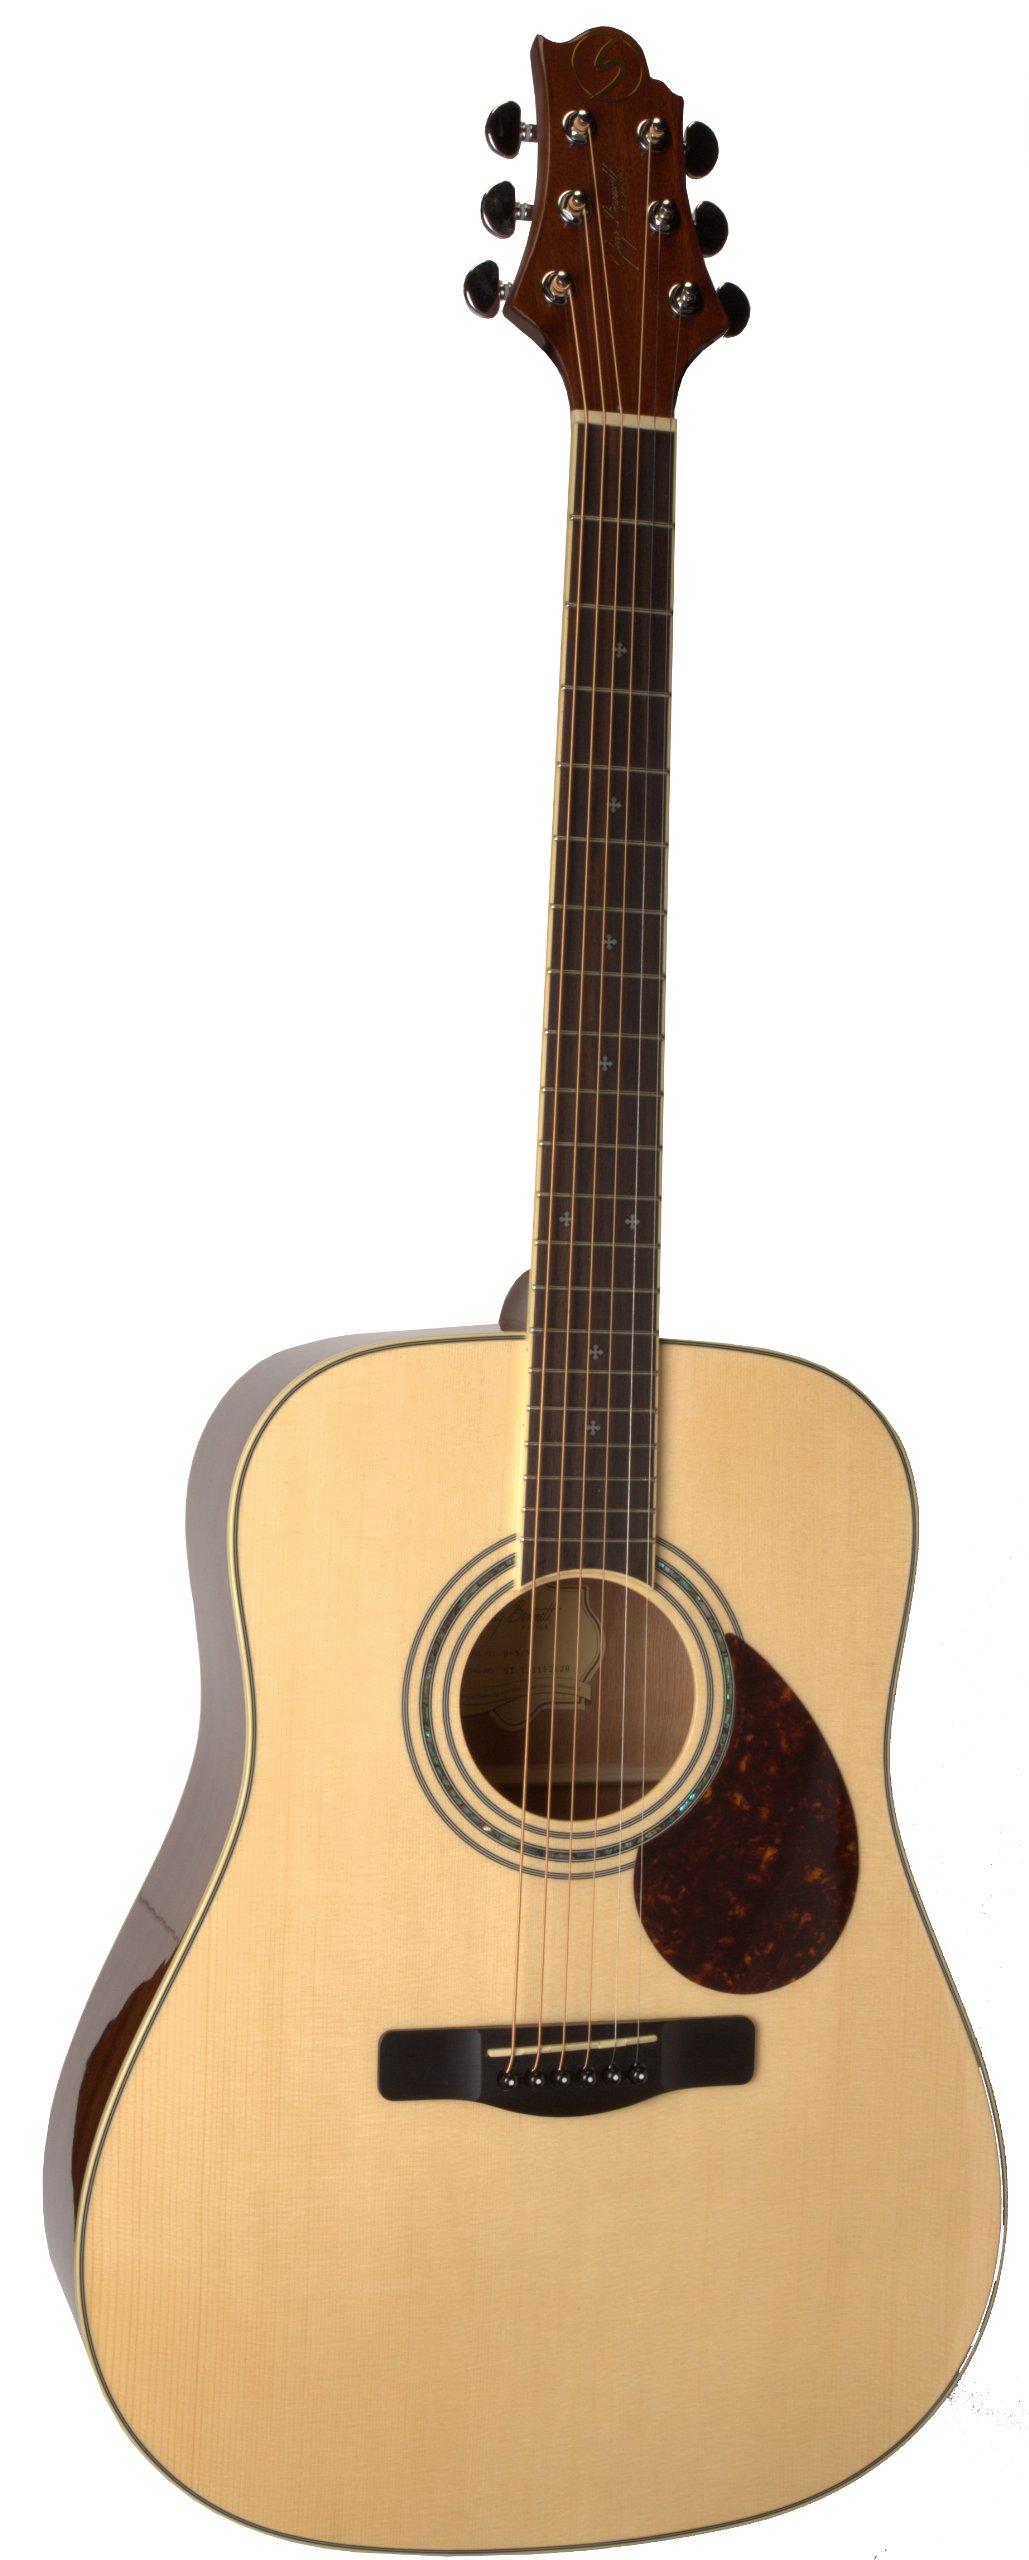 Samick Greg Bennett Design D5 Acoustic Guitar, Natural by Samick